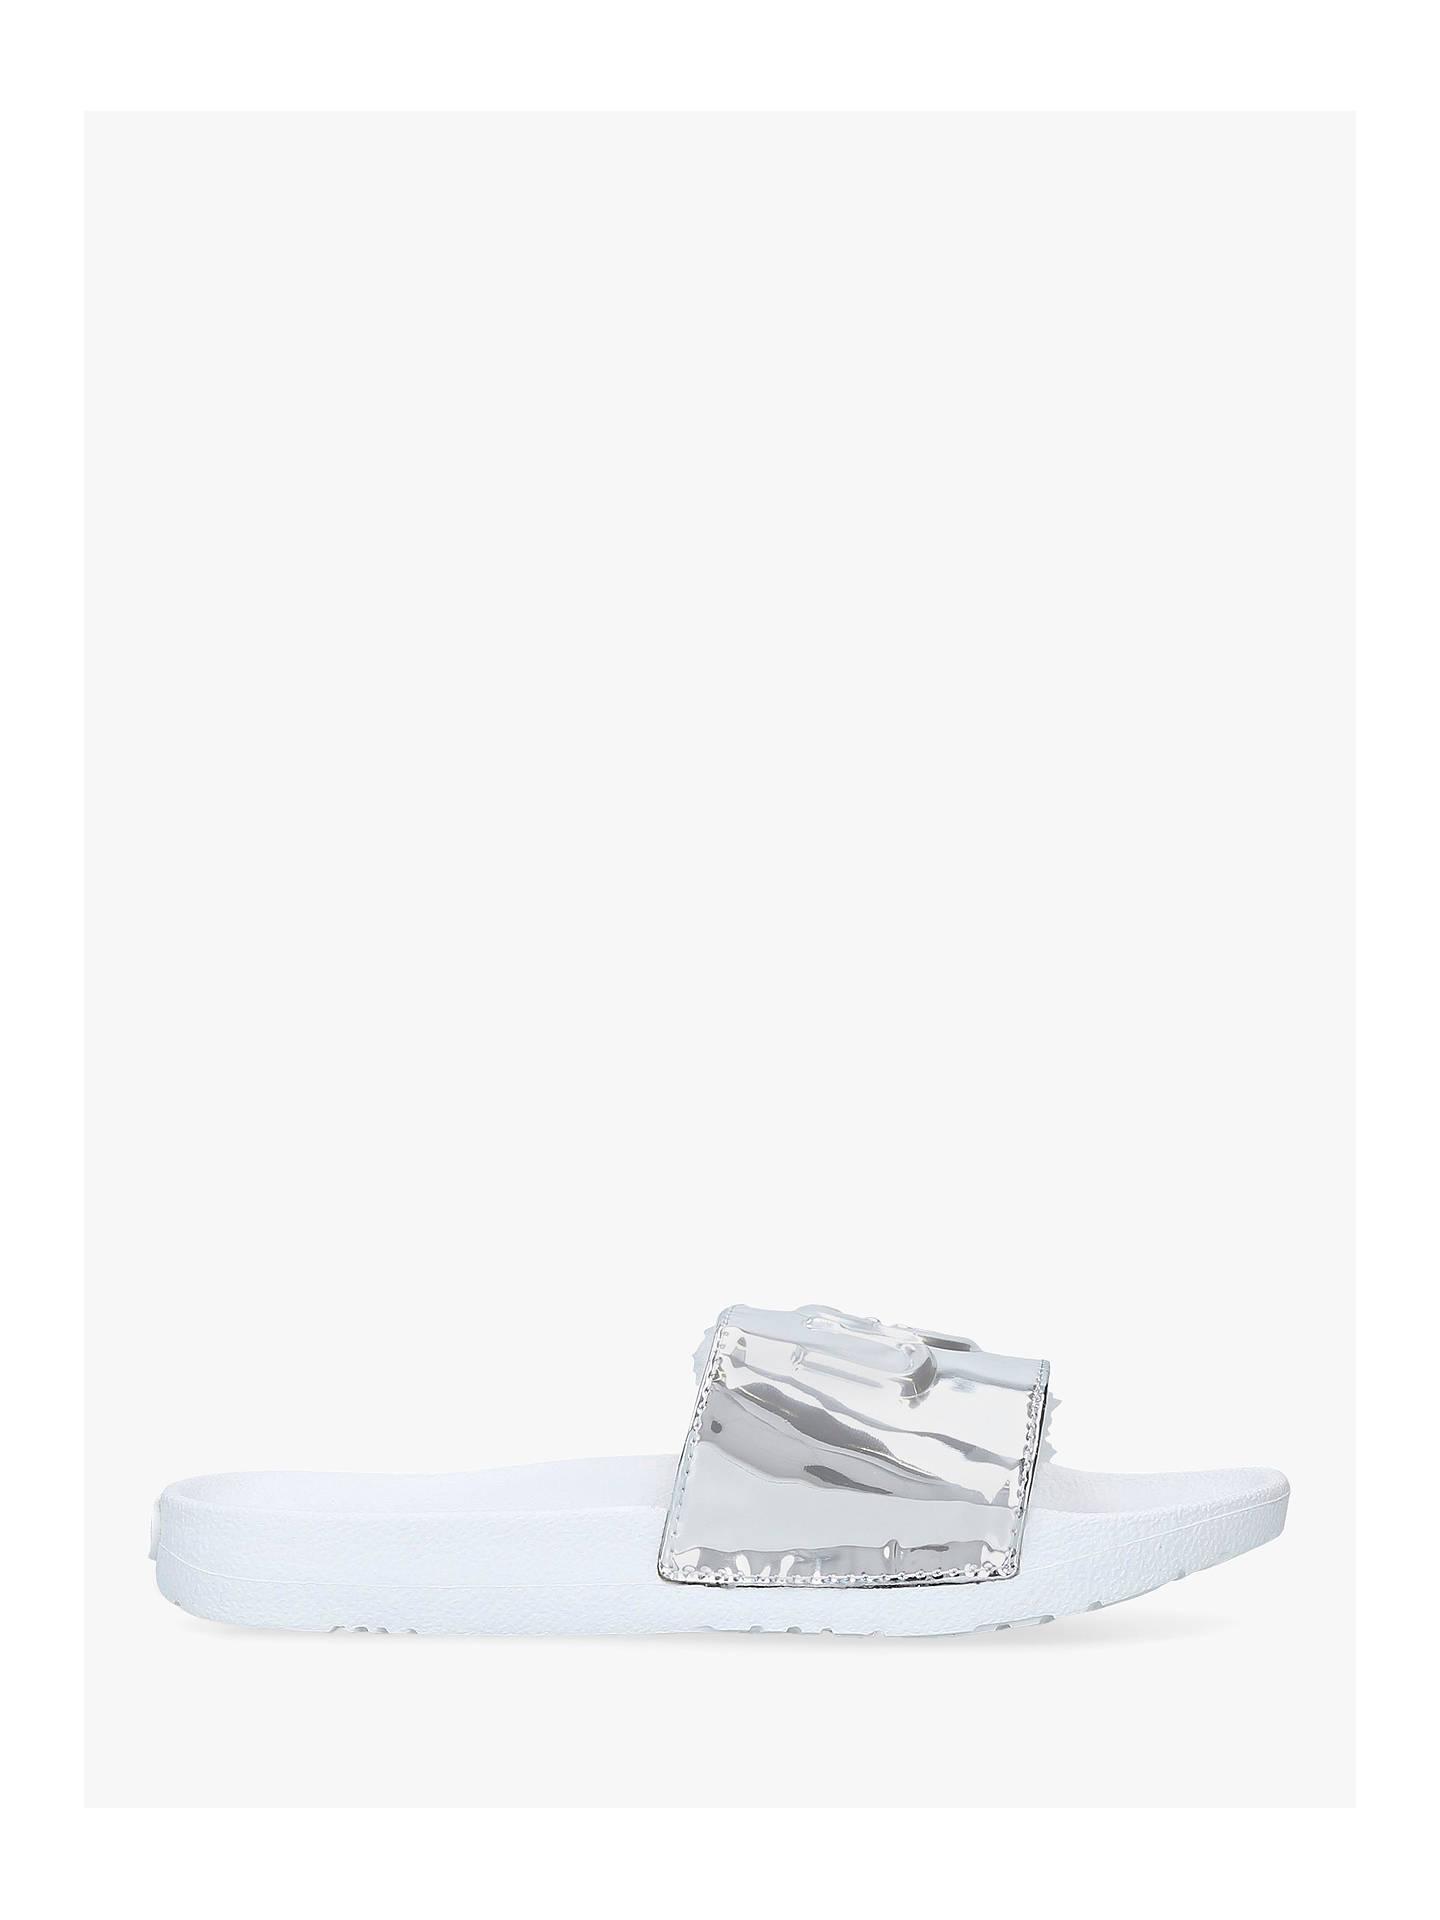 133e901d9 Buy UGG Royale Graphic Metallic Slider Sandals, Silver, 3 Online at  johnlewis.com ...